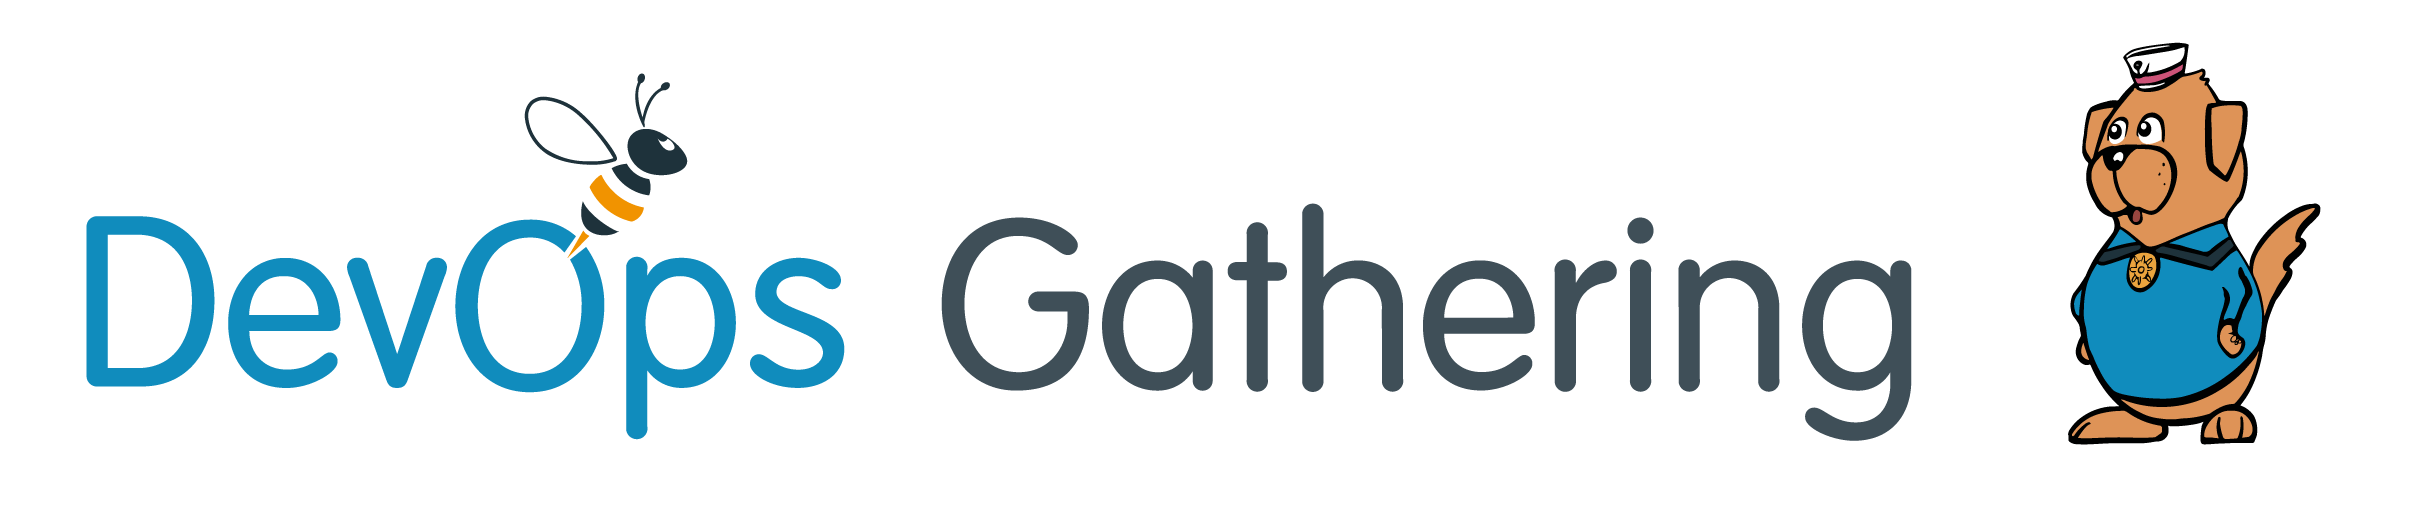 DevOps Gathering 2019